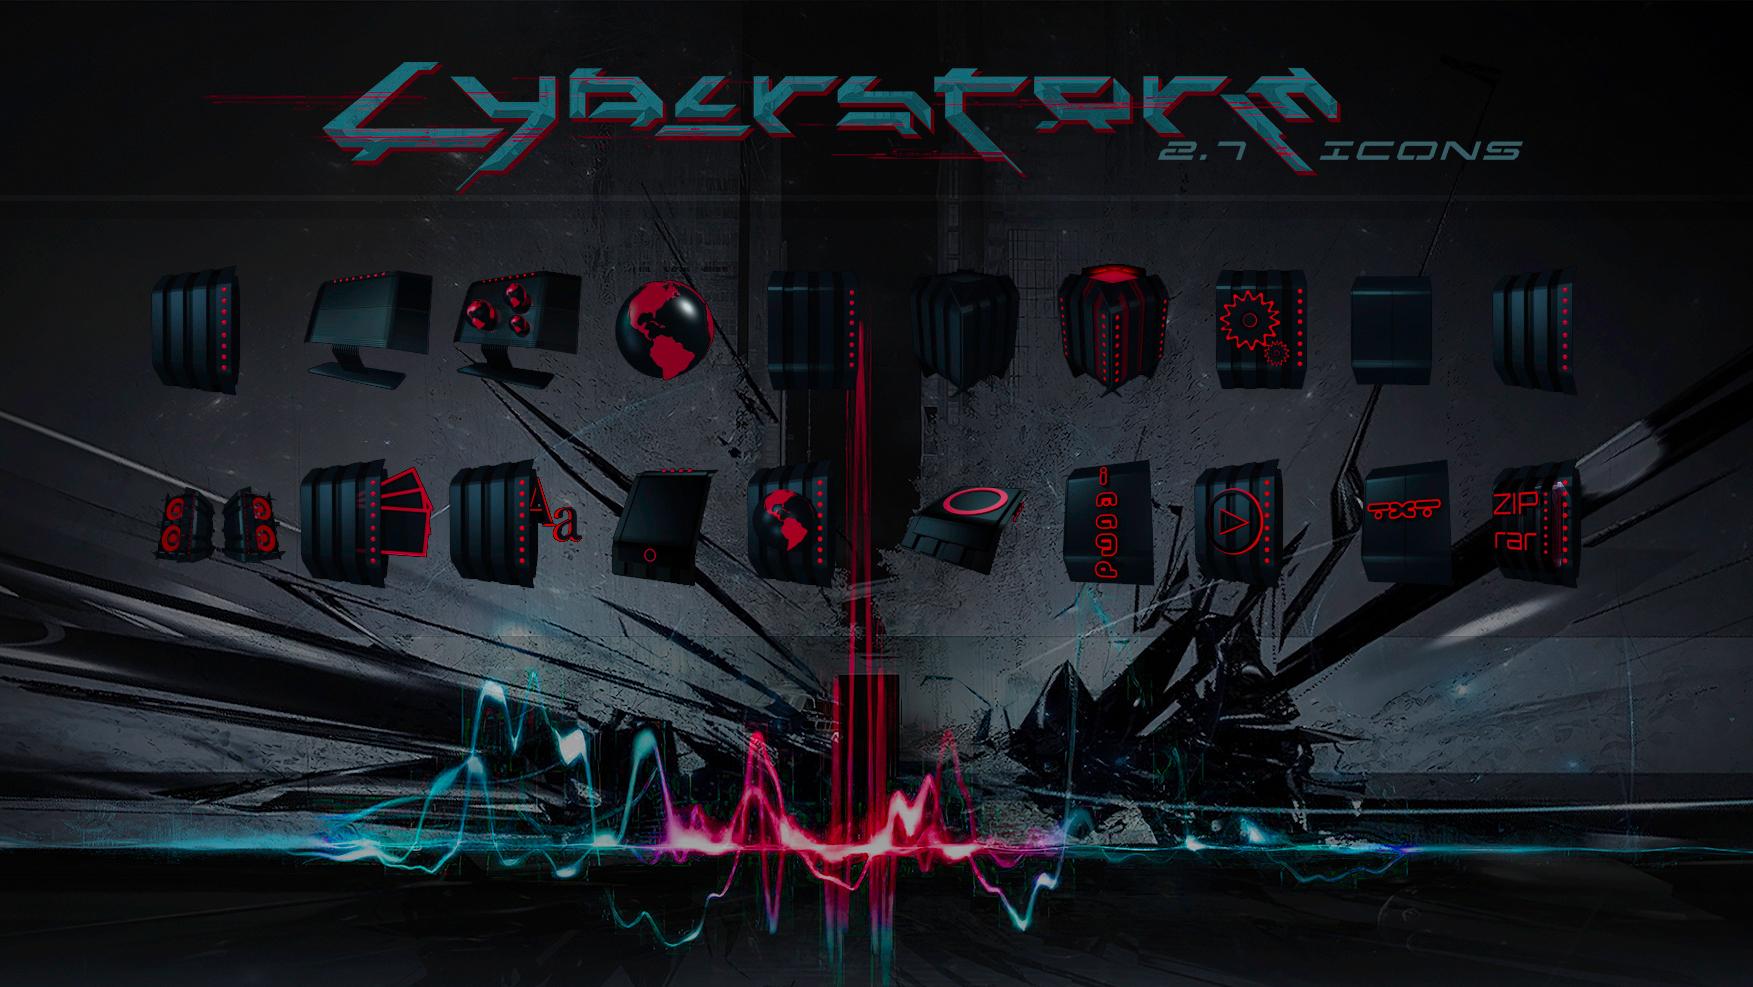 Cyberstorm 2.7 Icons Presentation